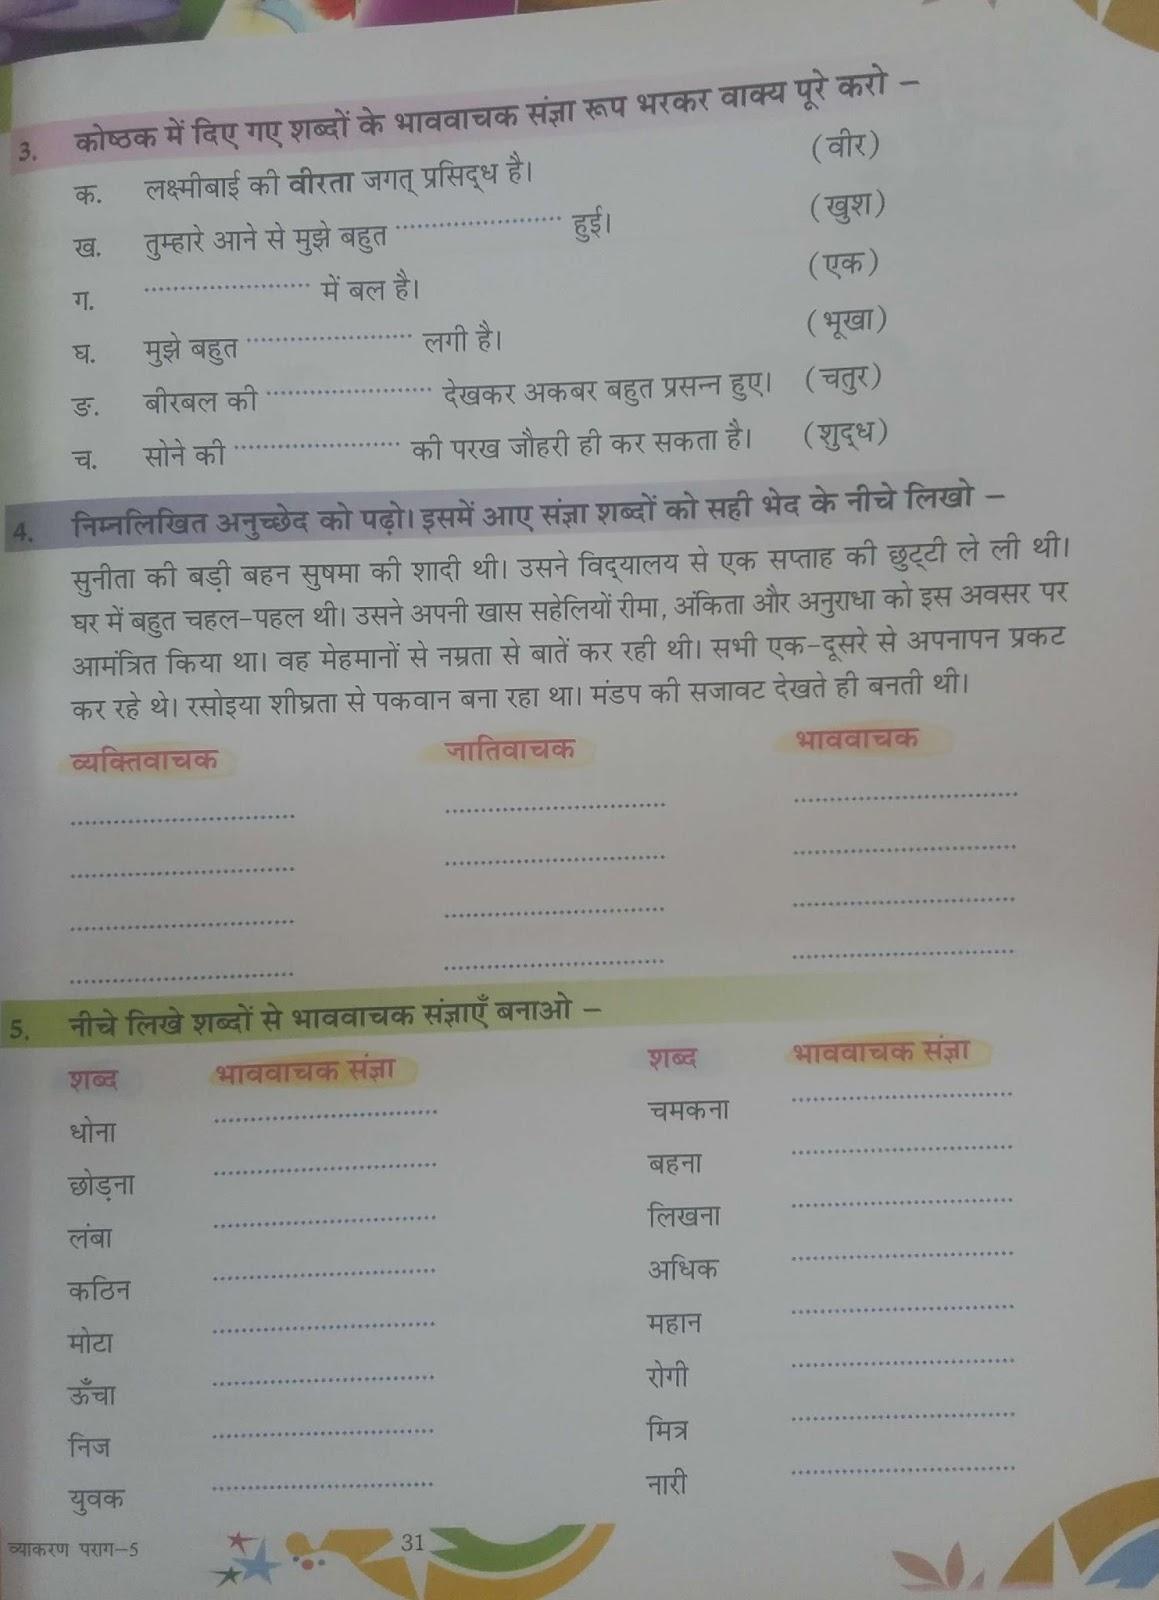 Hindi Grammar Work Sheet Collection for Classes 5,6, 7 & 8: Noun